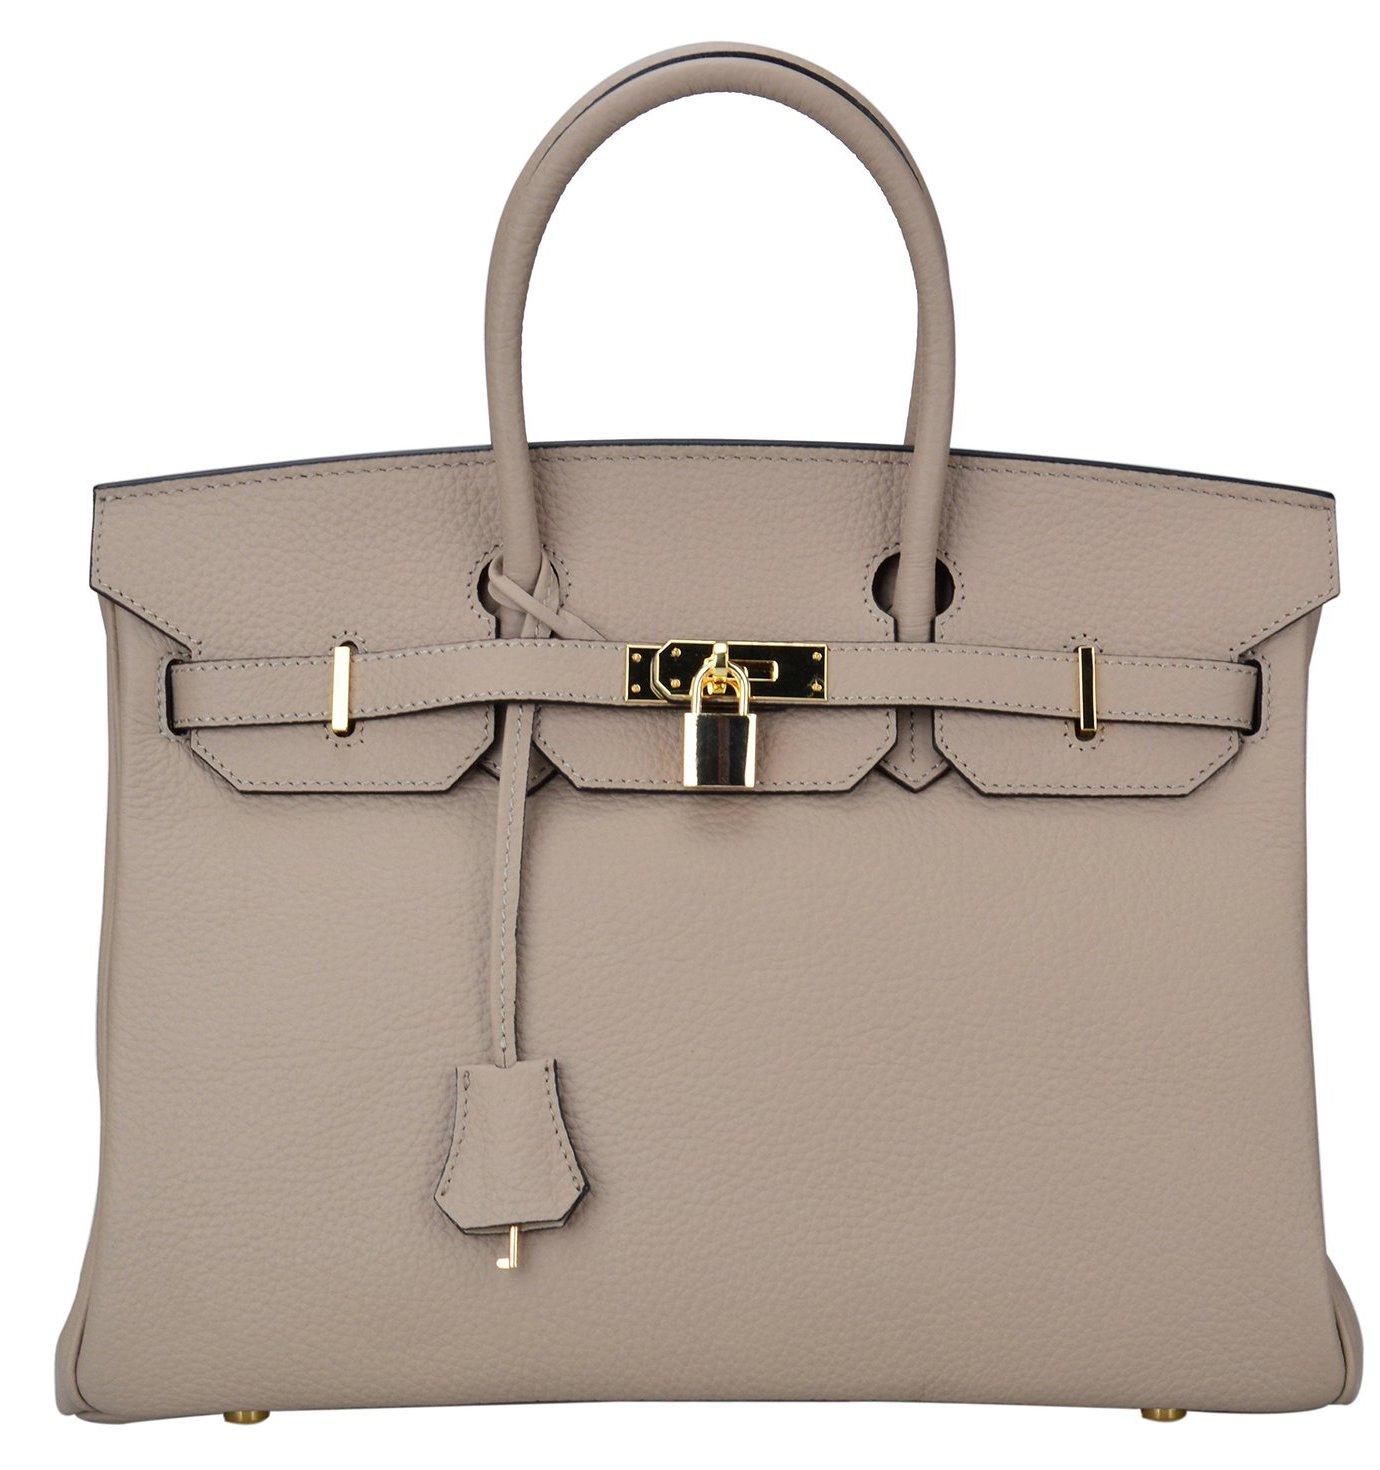 Ainifeel Women's Padlock Handbags with Golden Hardware (30cm, Taupe)